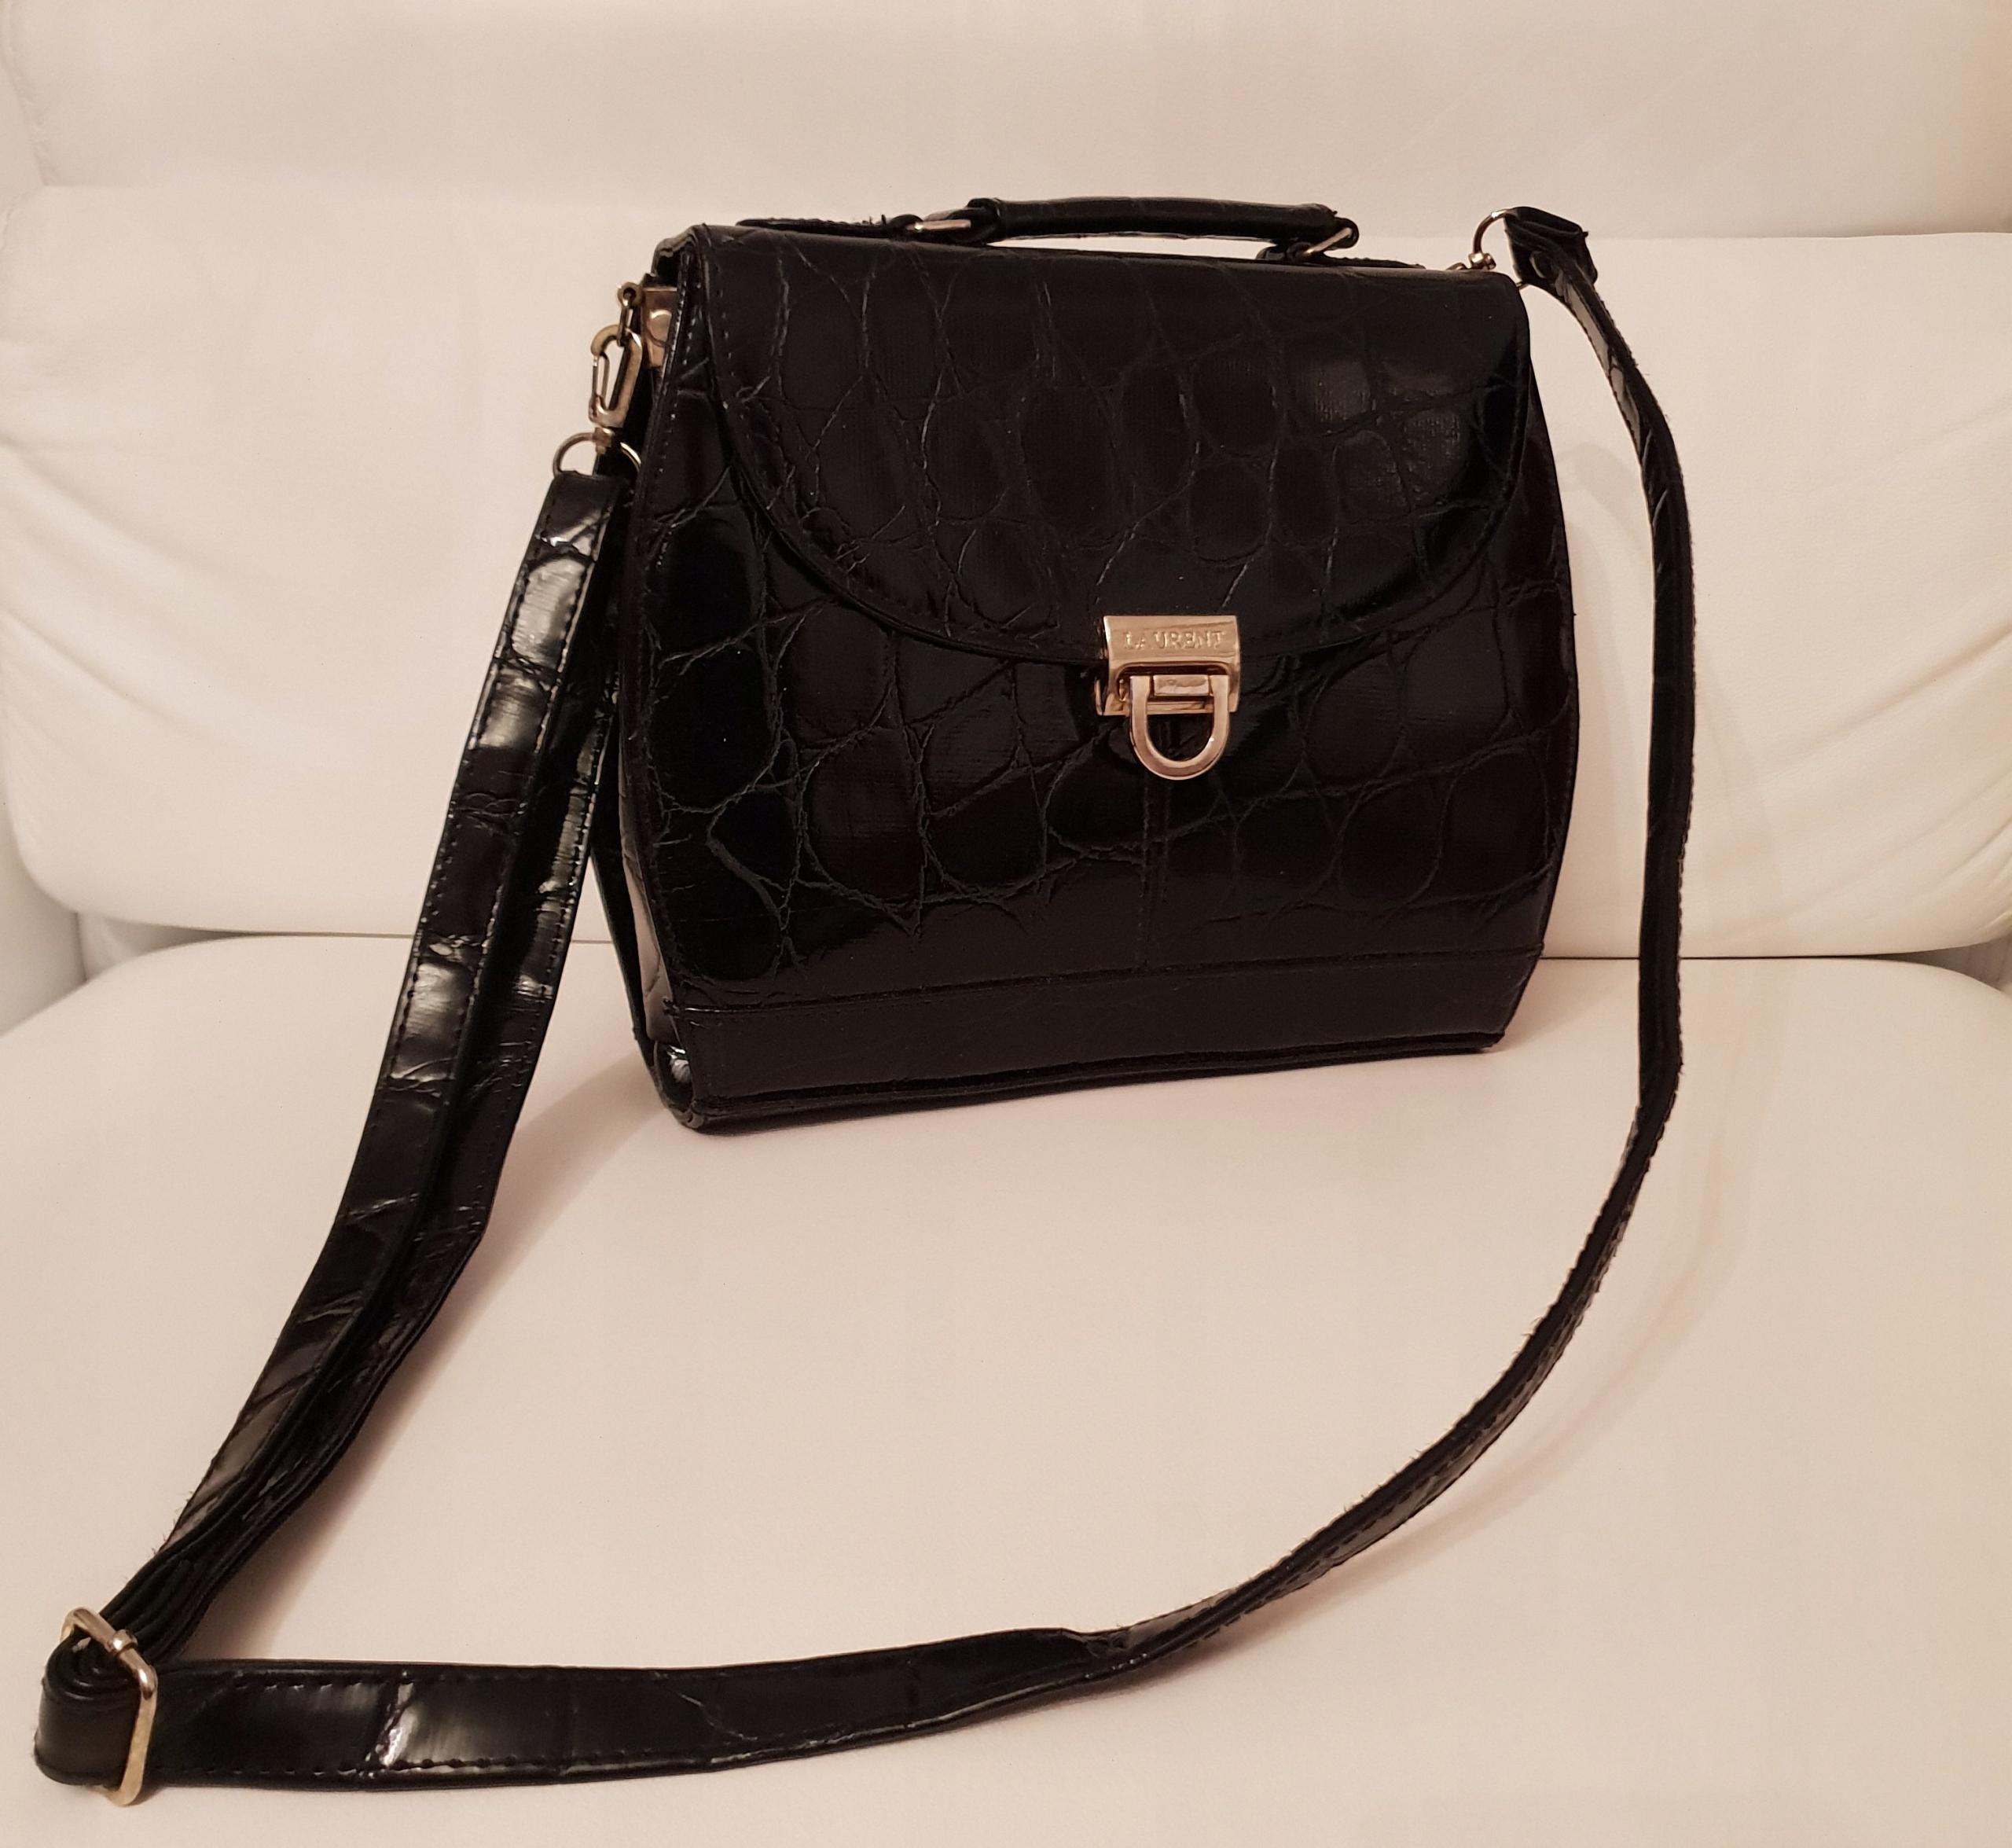 b56338be9c194 Laurent Chanel Prada Vuitton Skórzana Torebka - 7708868731 ...